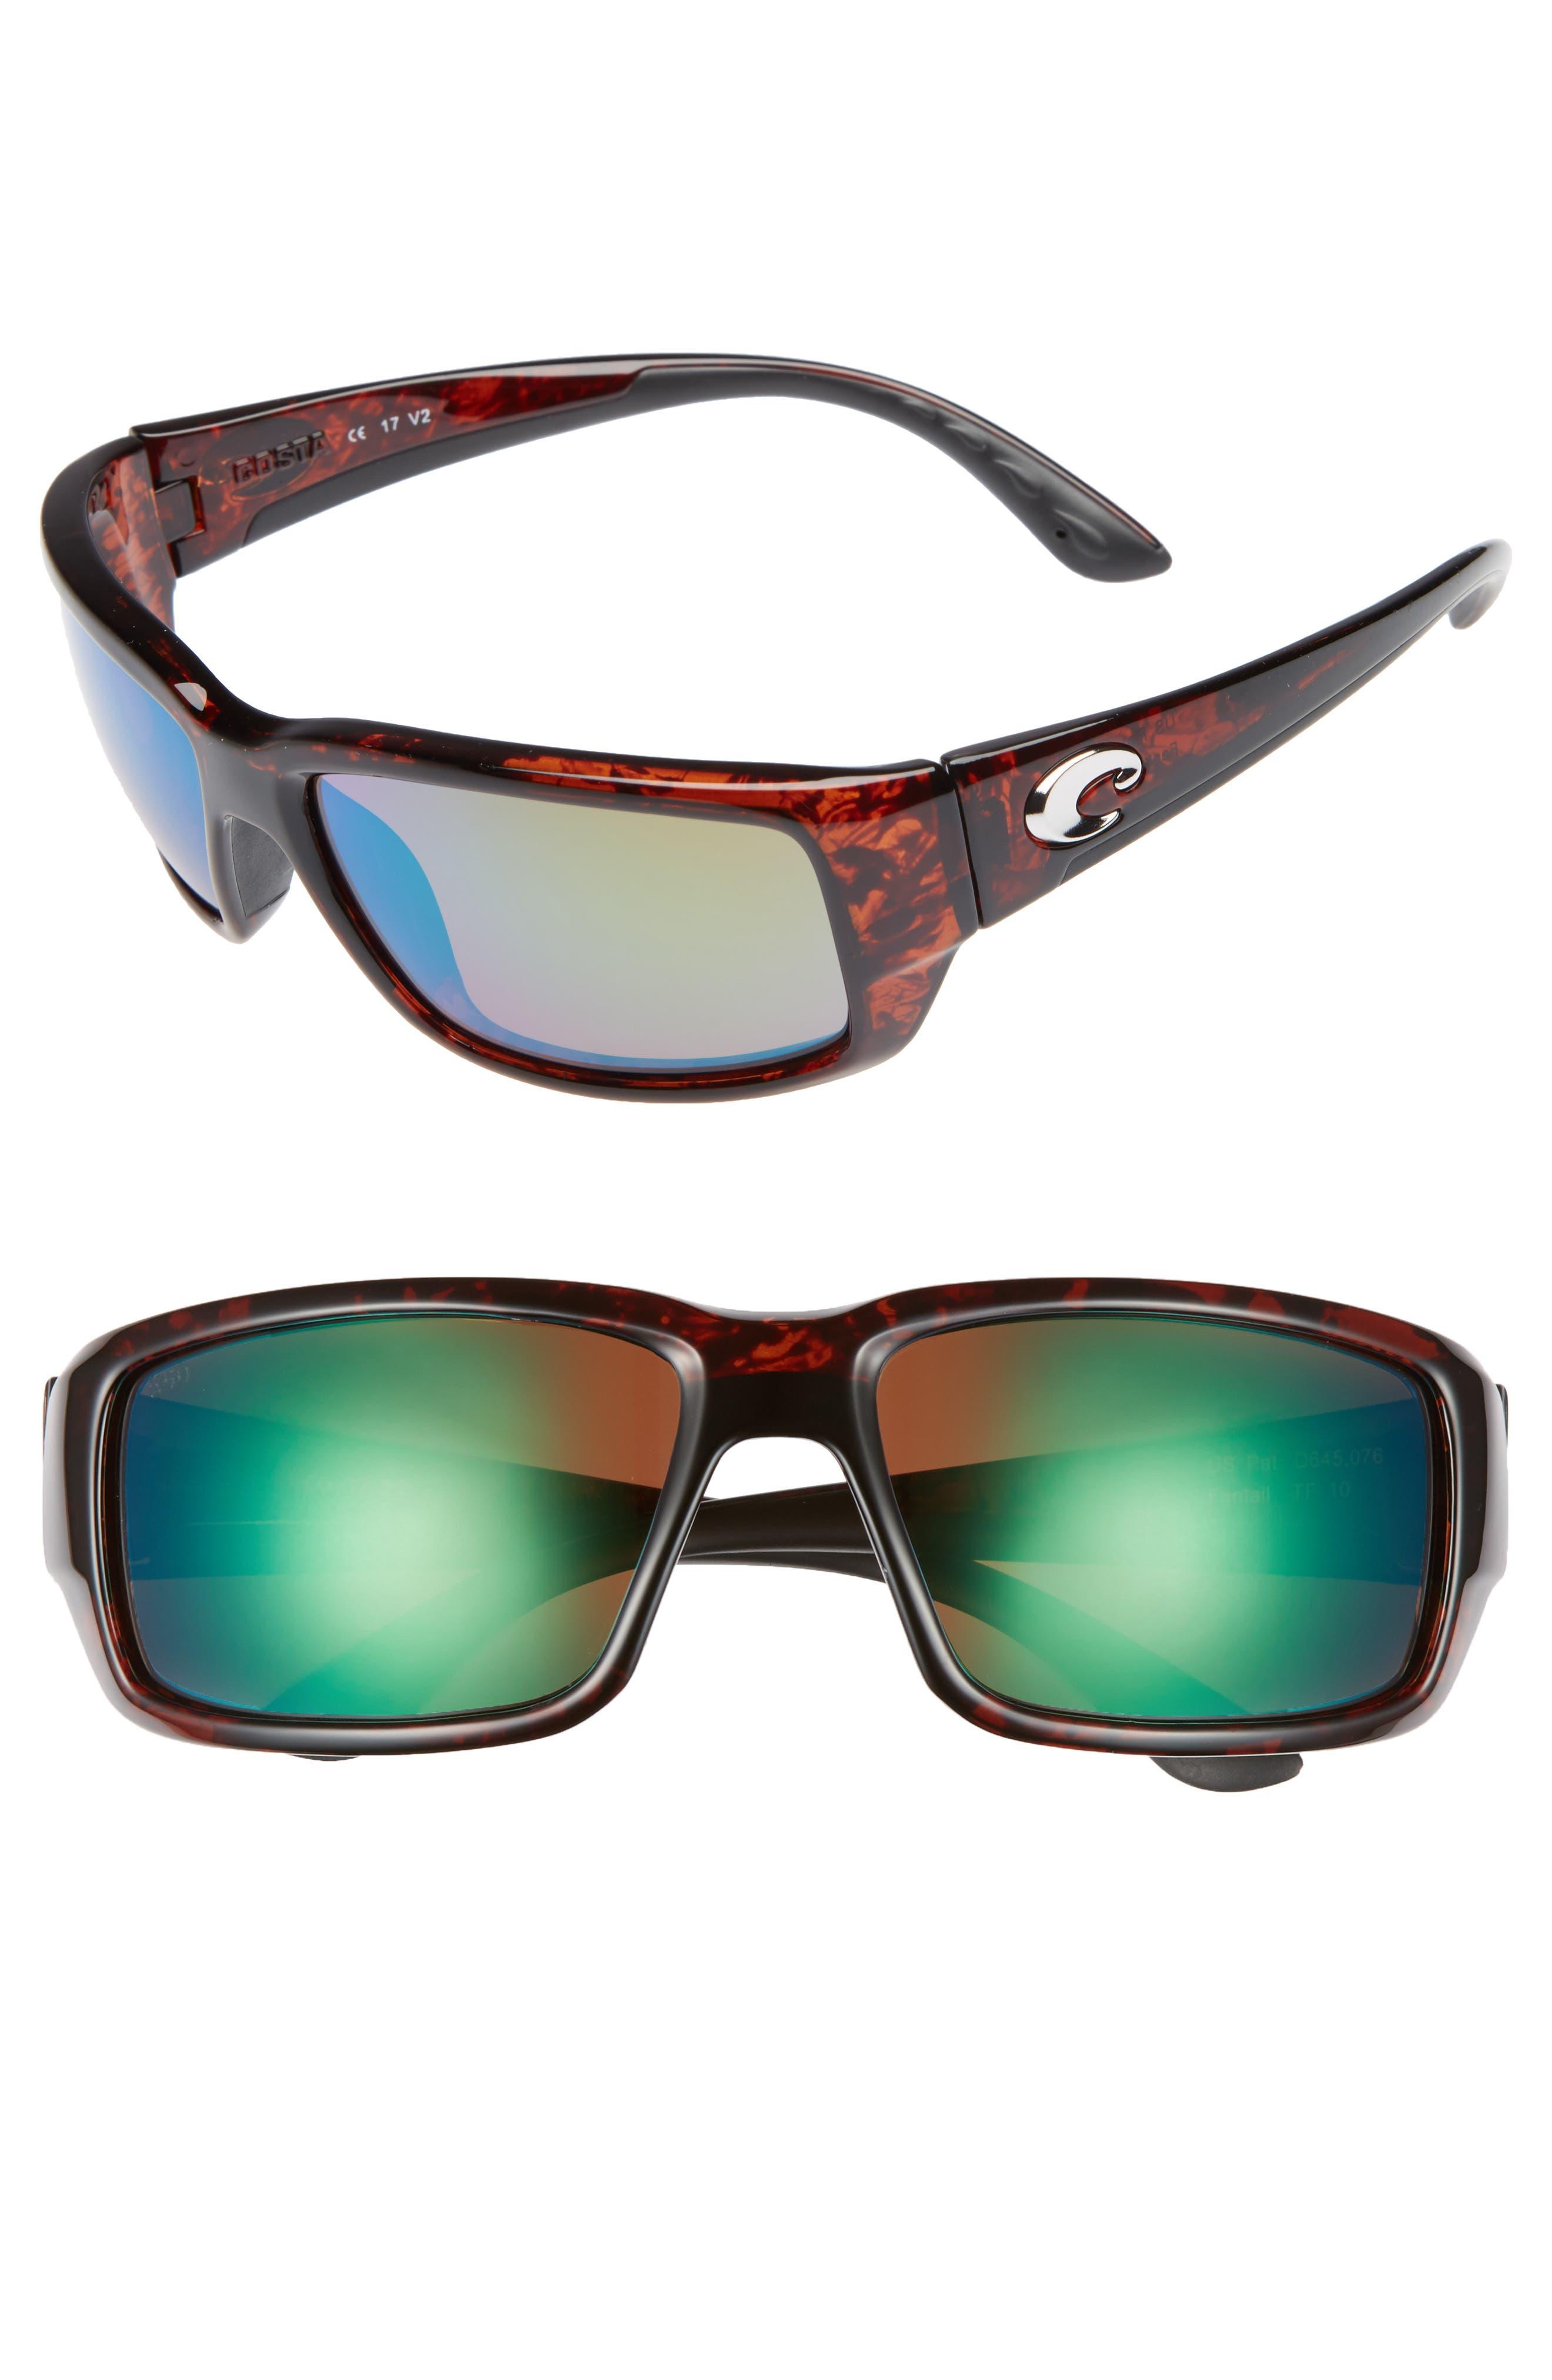 Fantail 60mm Polarized Sunglasses,                         Main,                         color, Tortoise/ Green Mirror